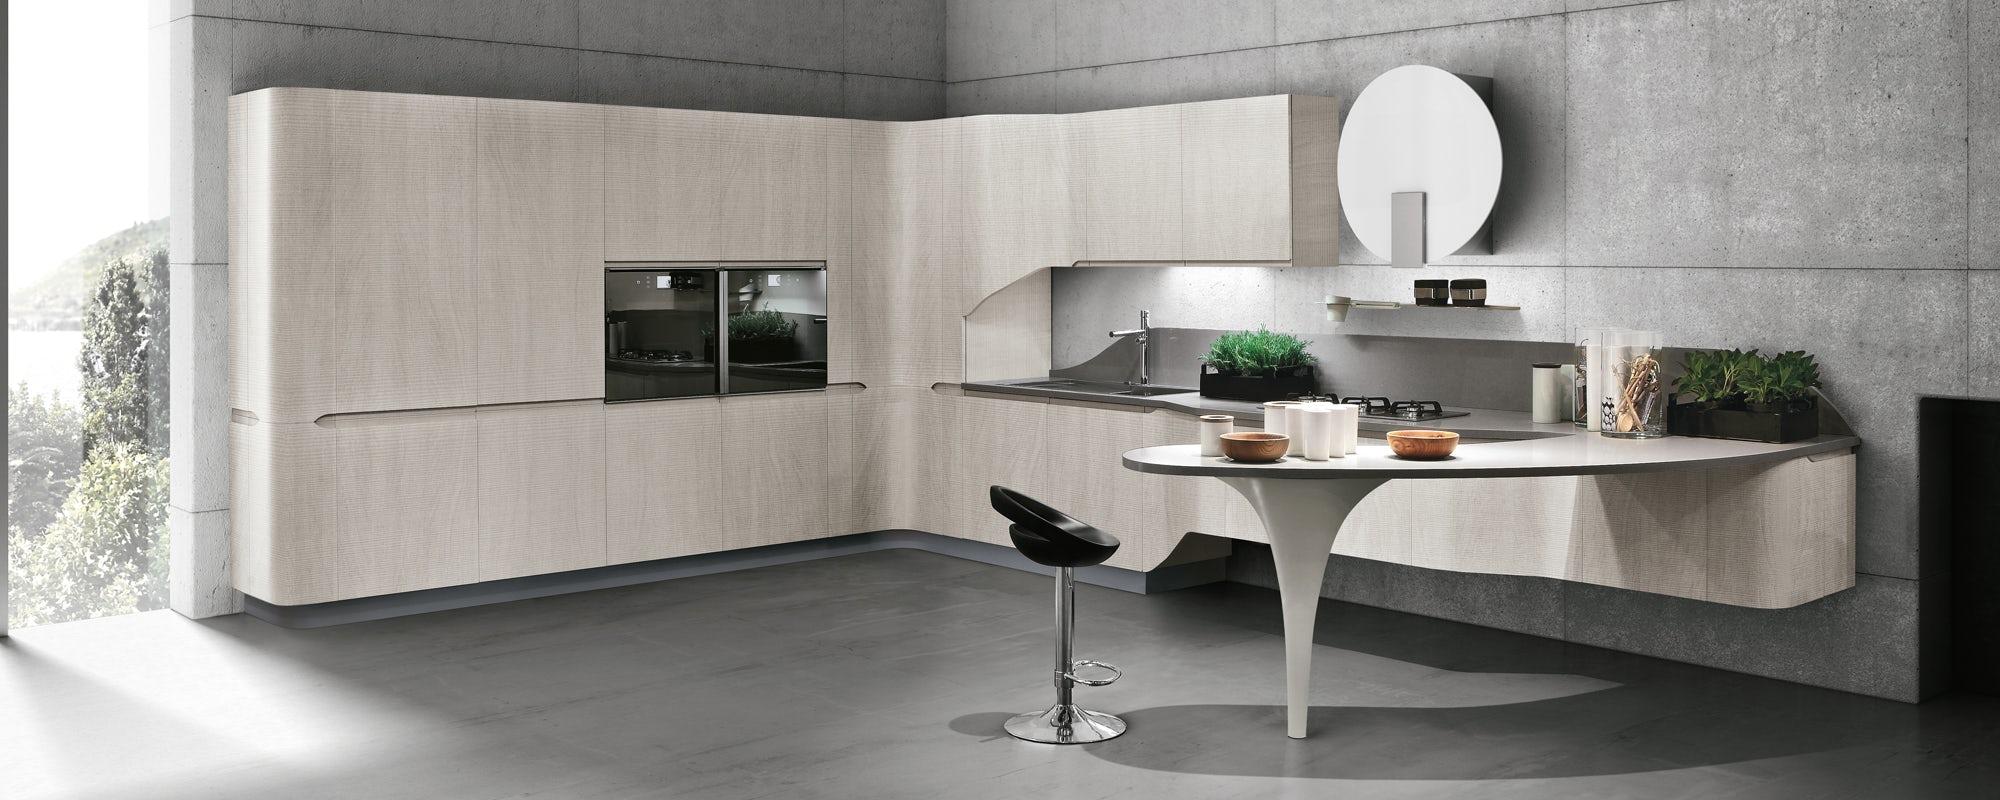 Cucina Bring Cucine Roma